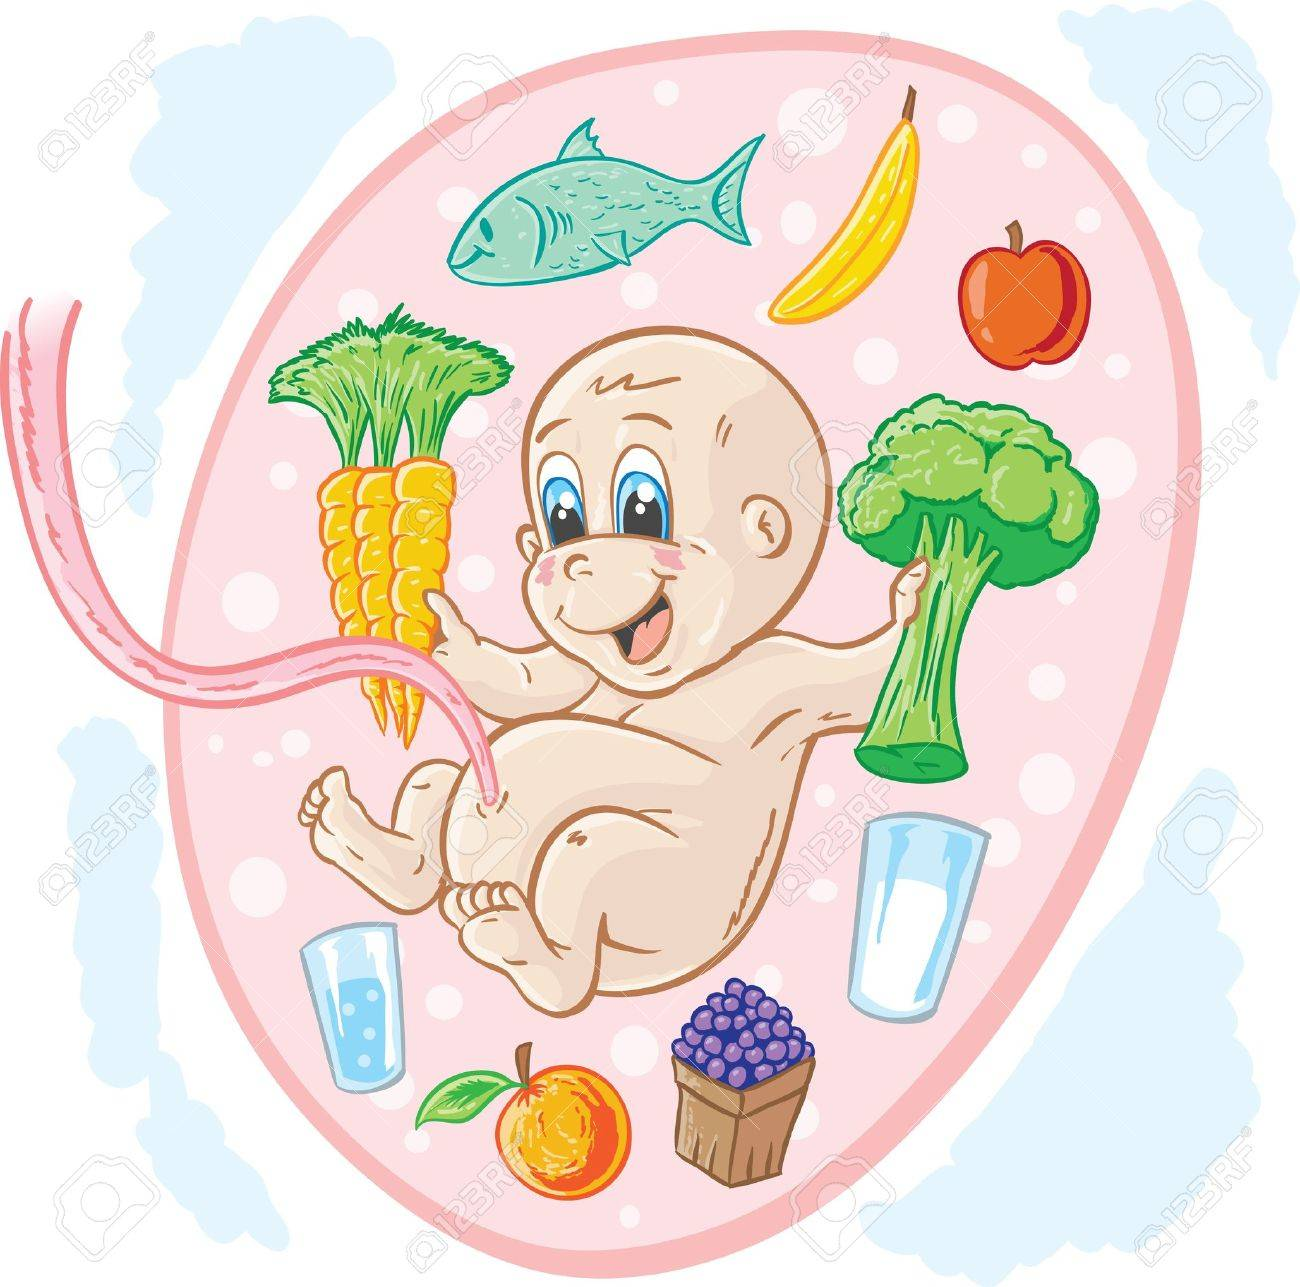 Healthy baby - 20342469